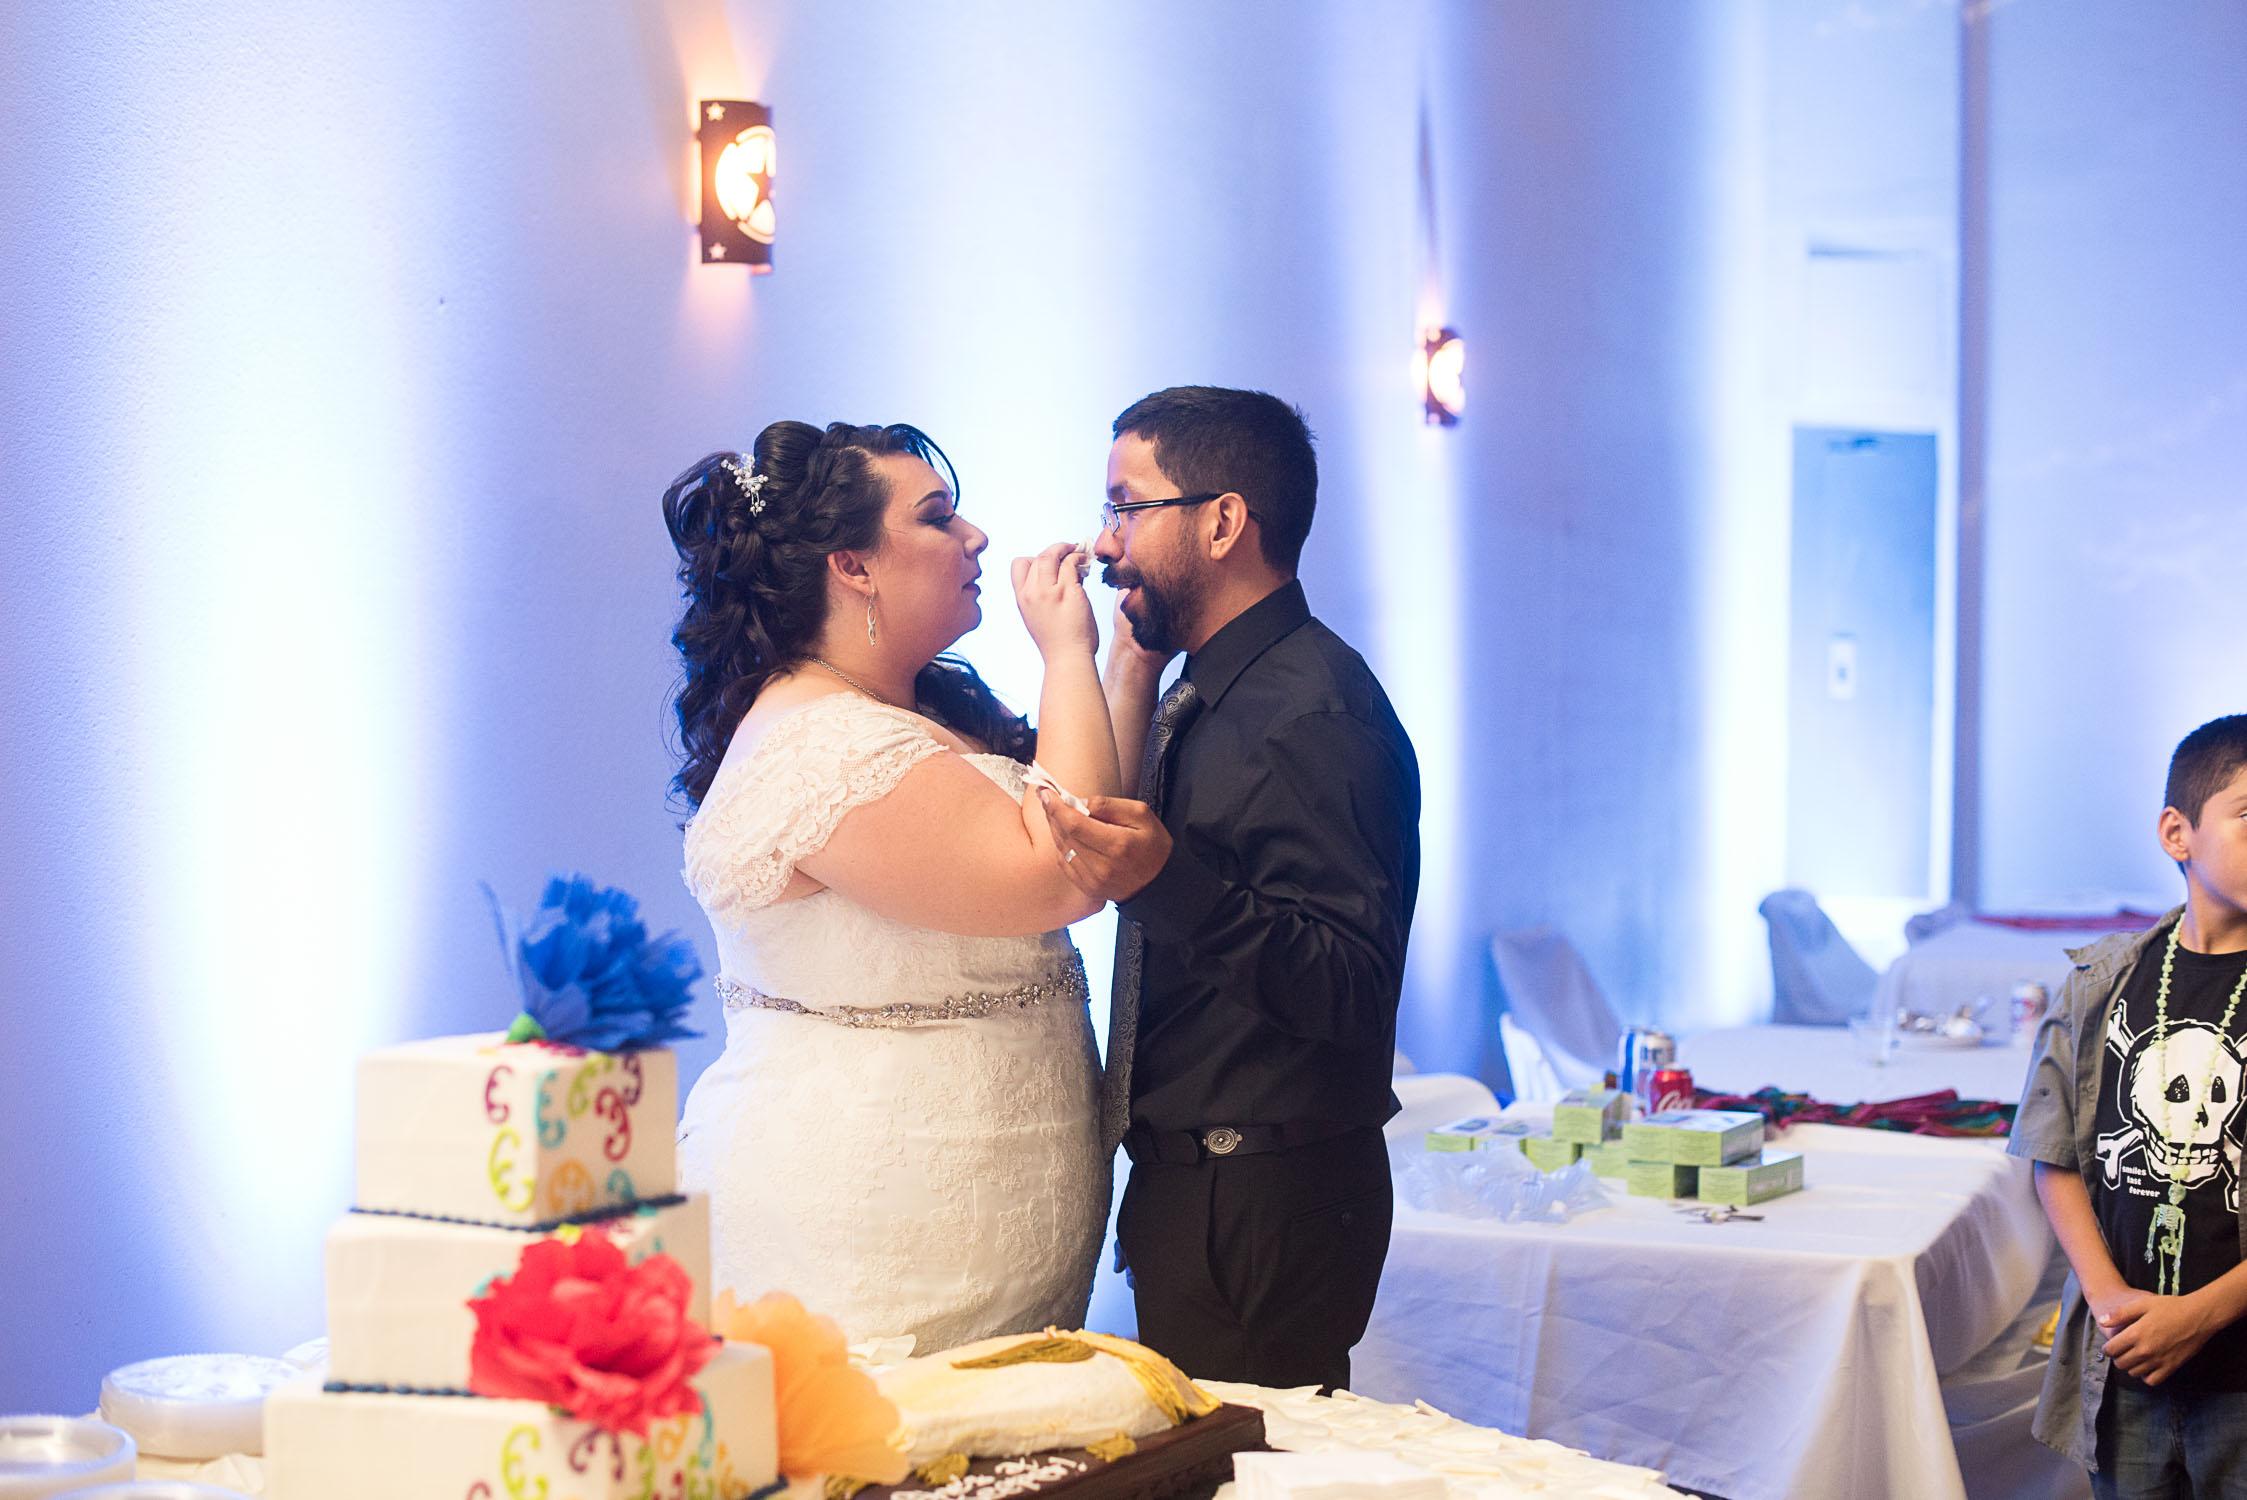 Leal Wedding Mira Visu Photography-188.jpg